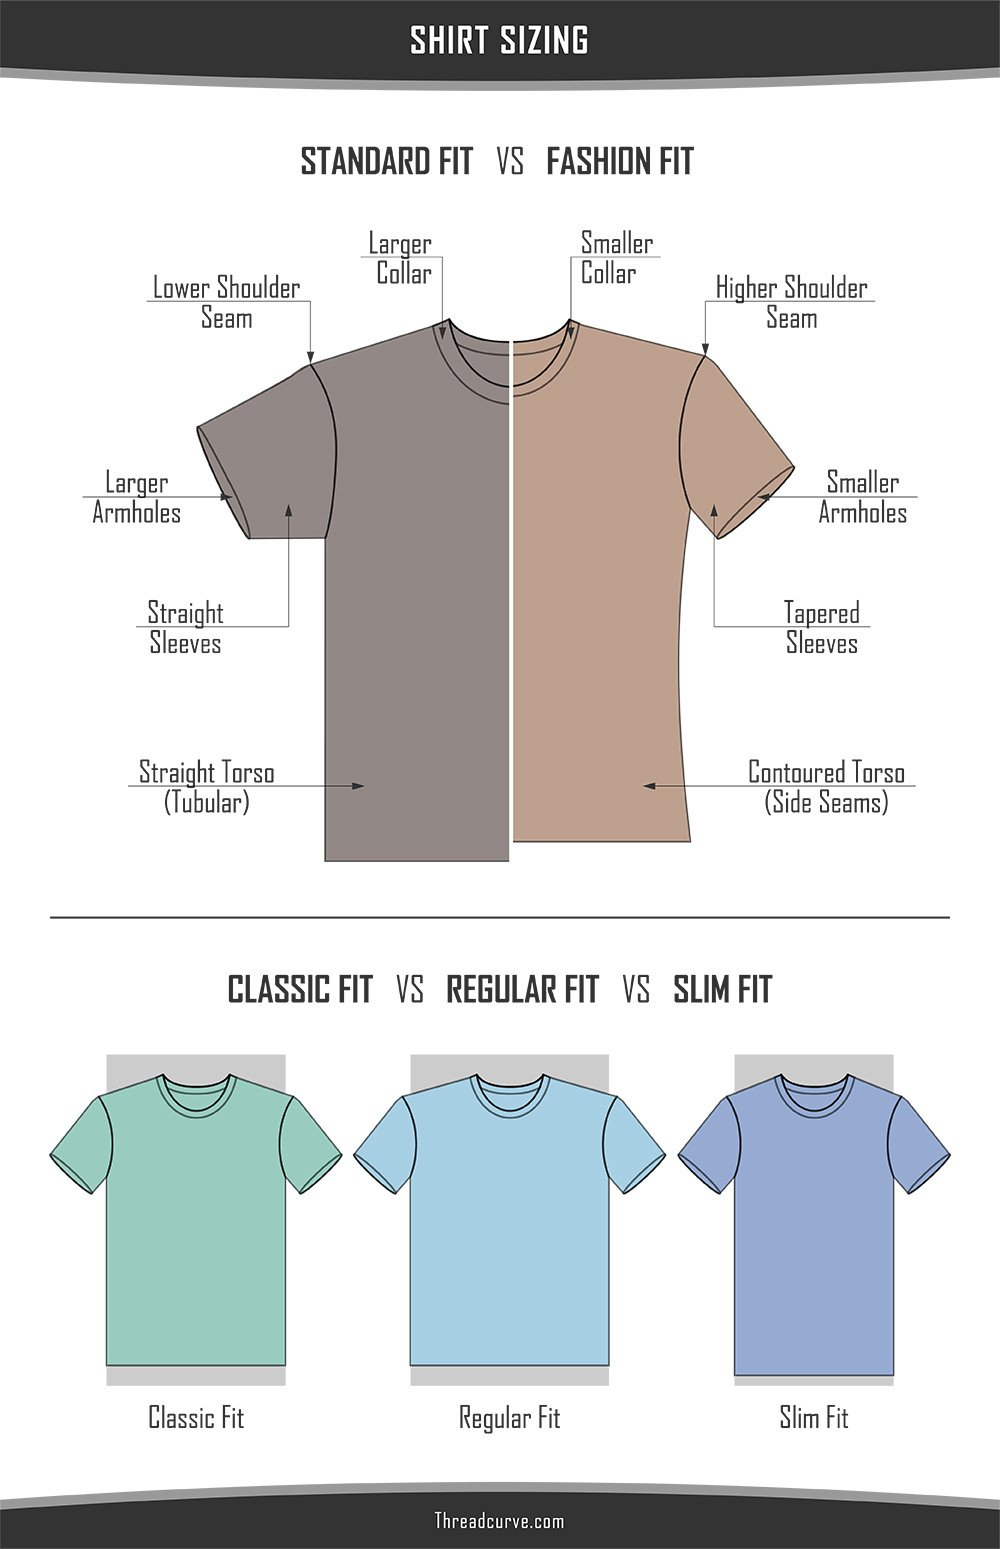 Classic vs regular vs slim fit shirt sizing chart